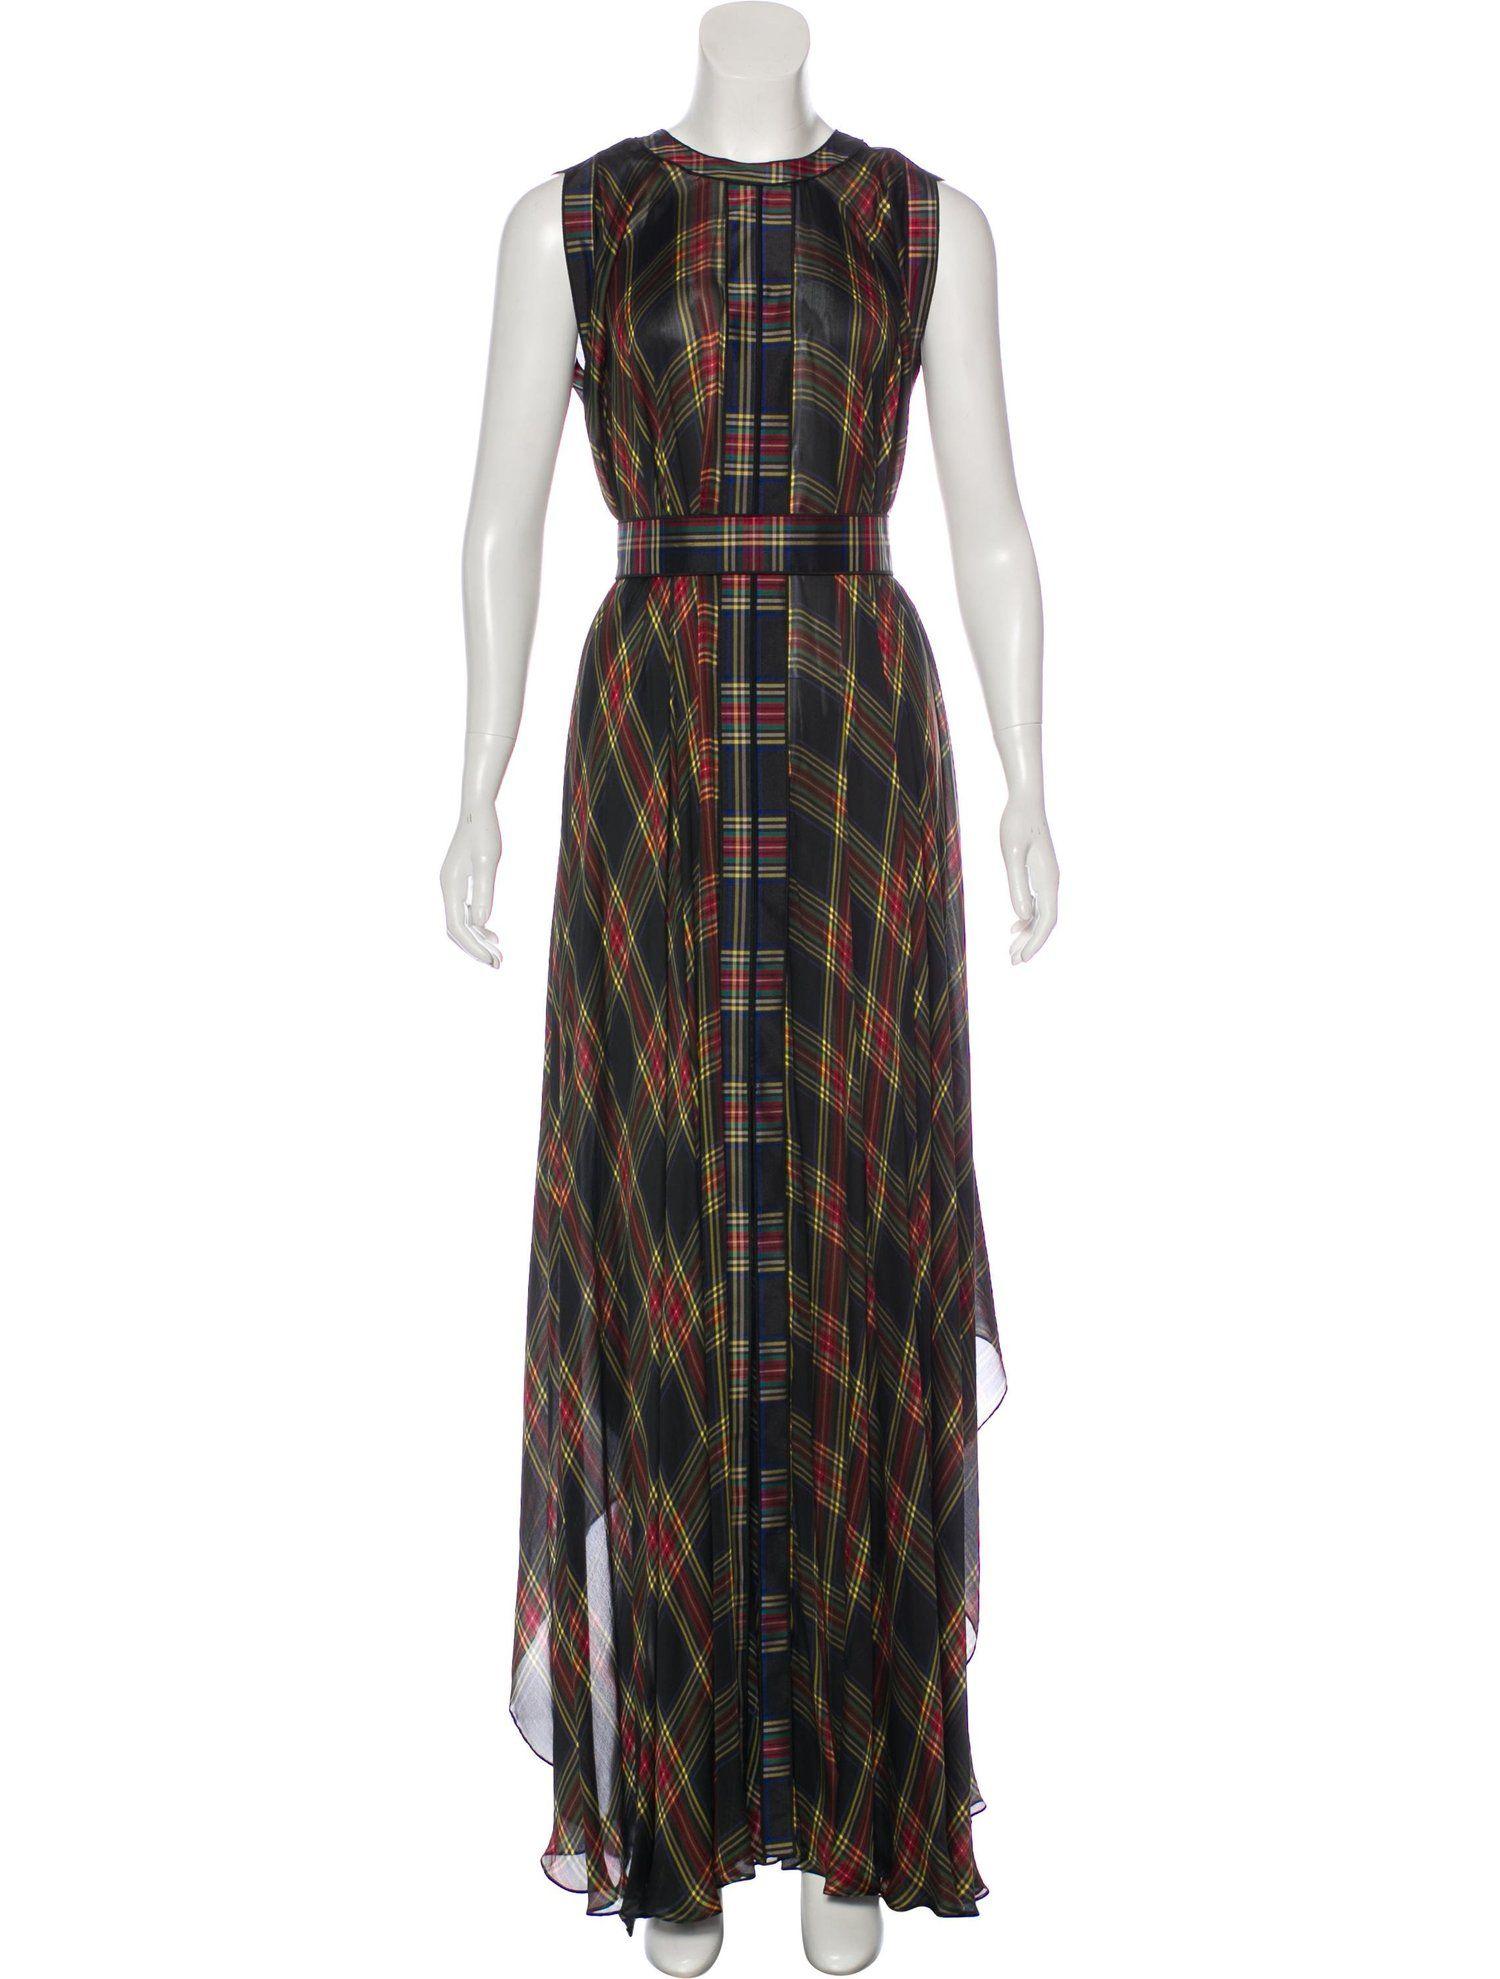 7c5d8737dde0 Maison Rabih Kayrouz Printed Maxi Dress w  Tags - Clothing - MKY20340